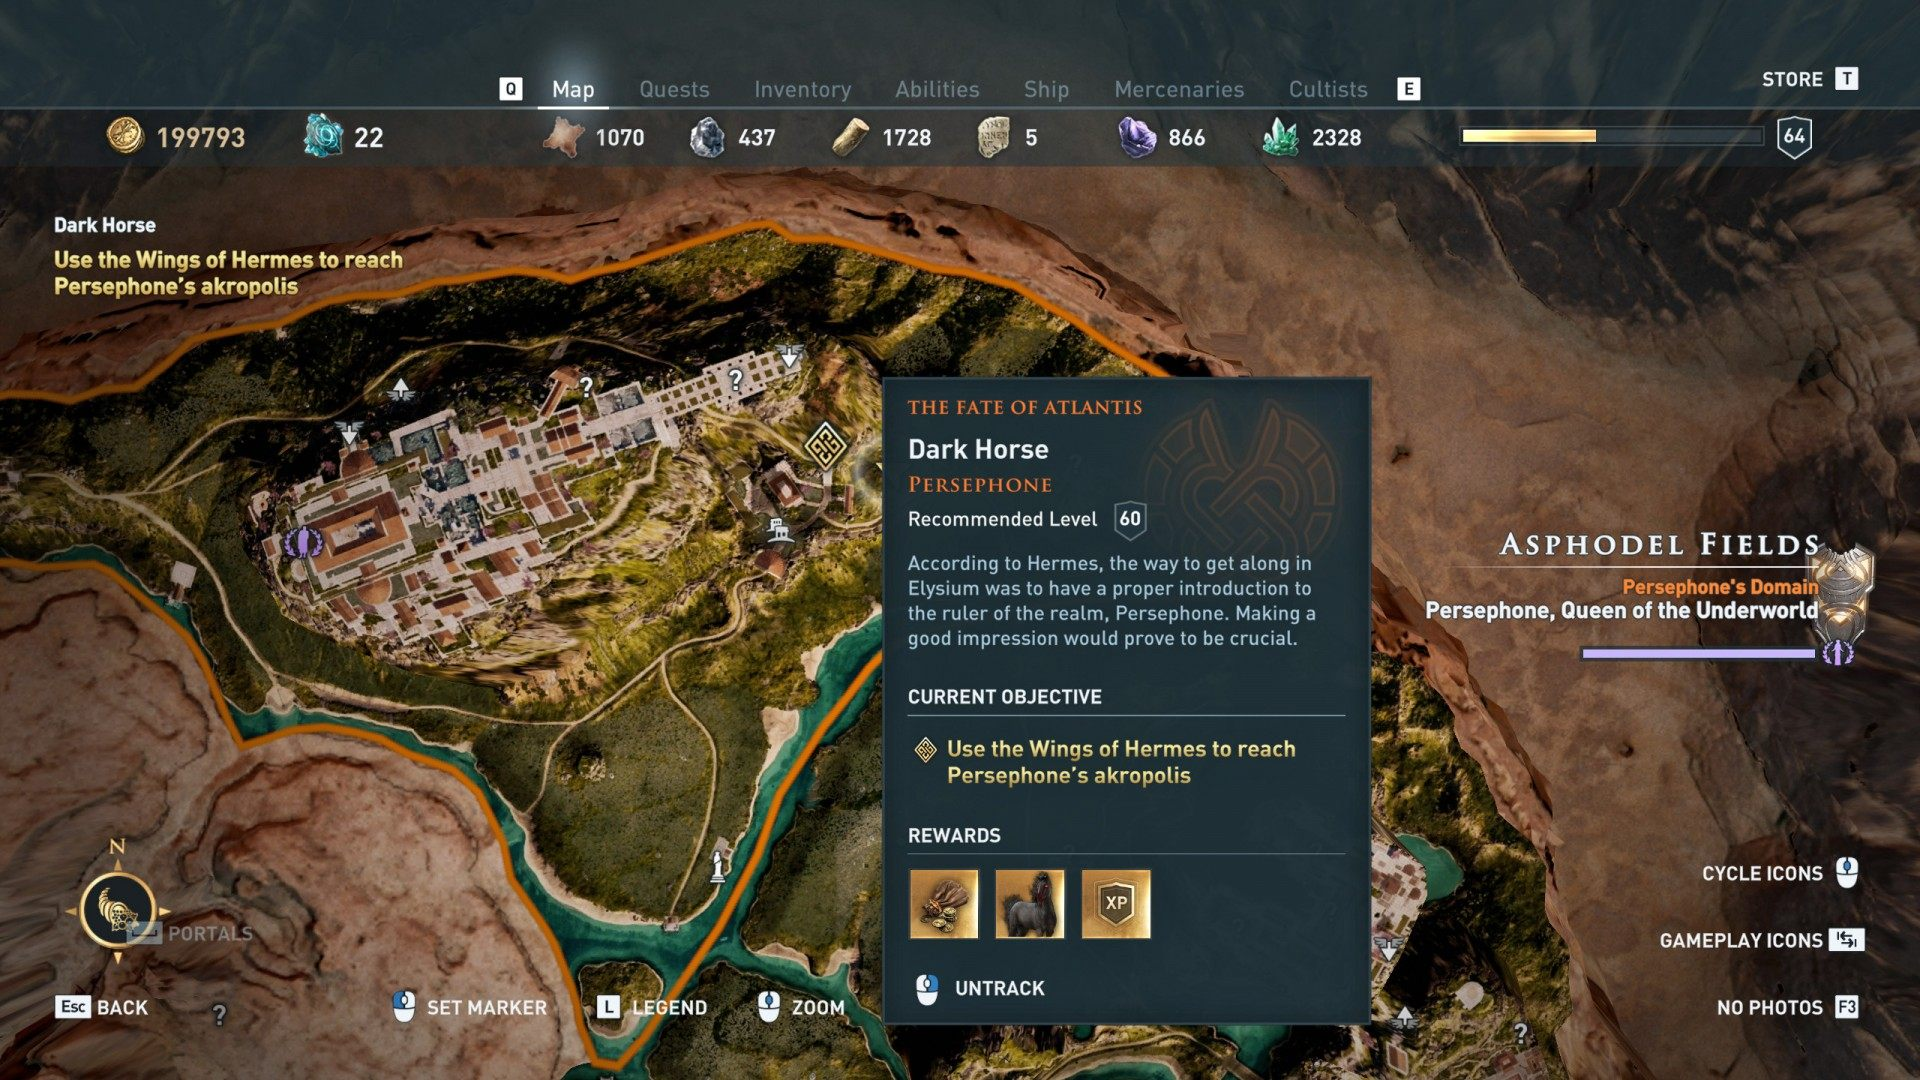 Dark Horse, Assassin's Creed Odyssey Quest